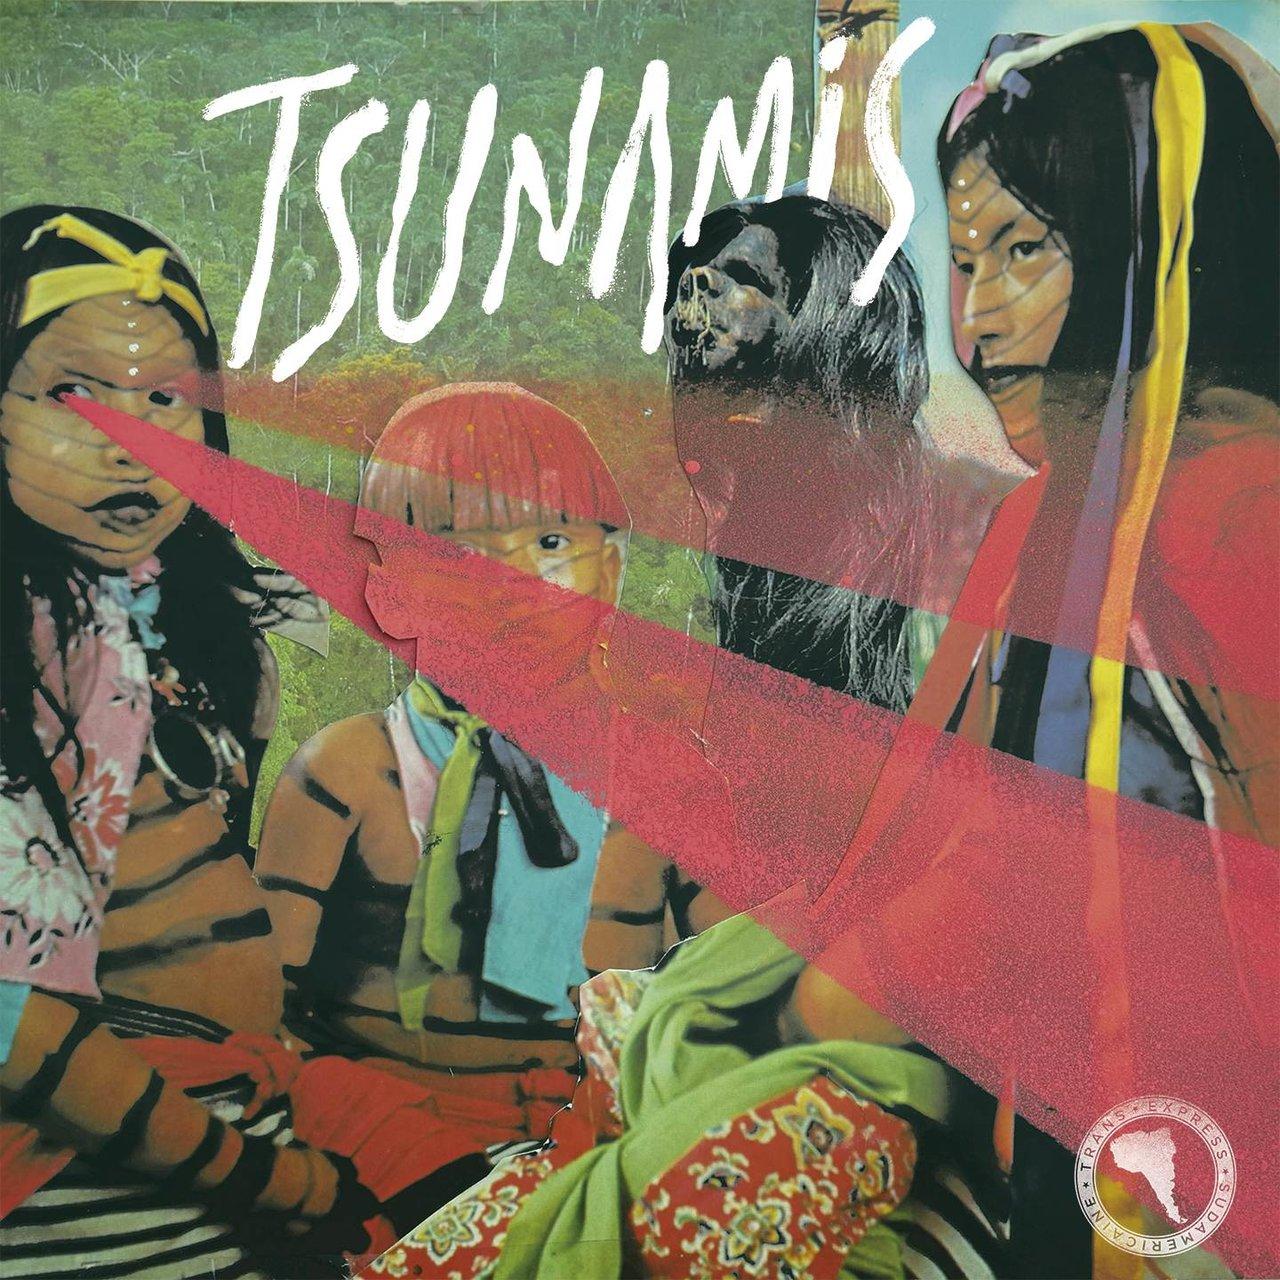 Tsunamis – Trans Express Sudamericane (2017)